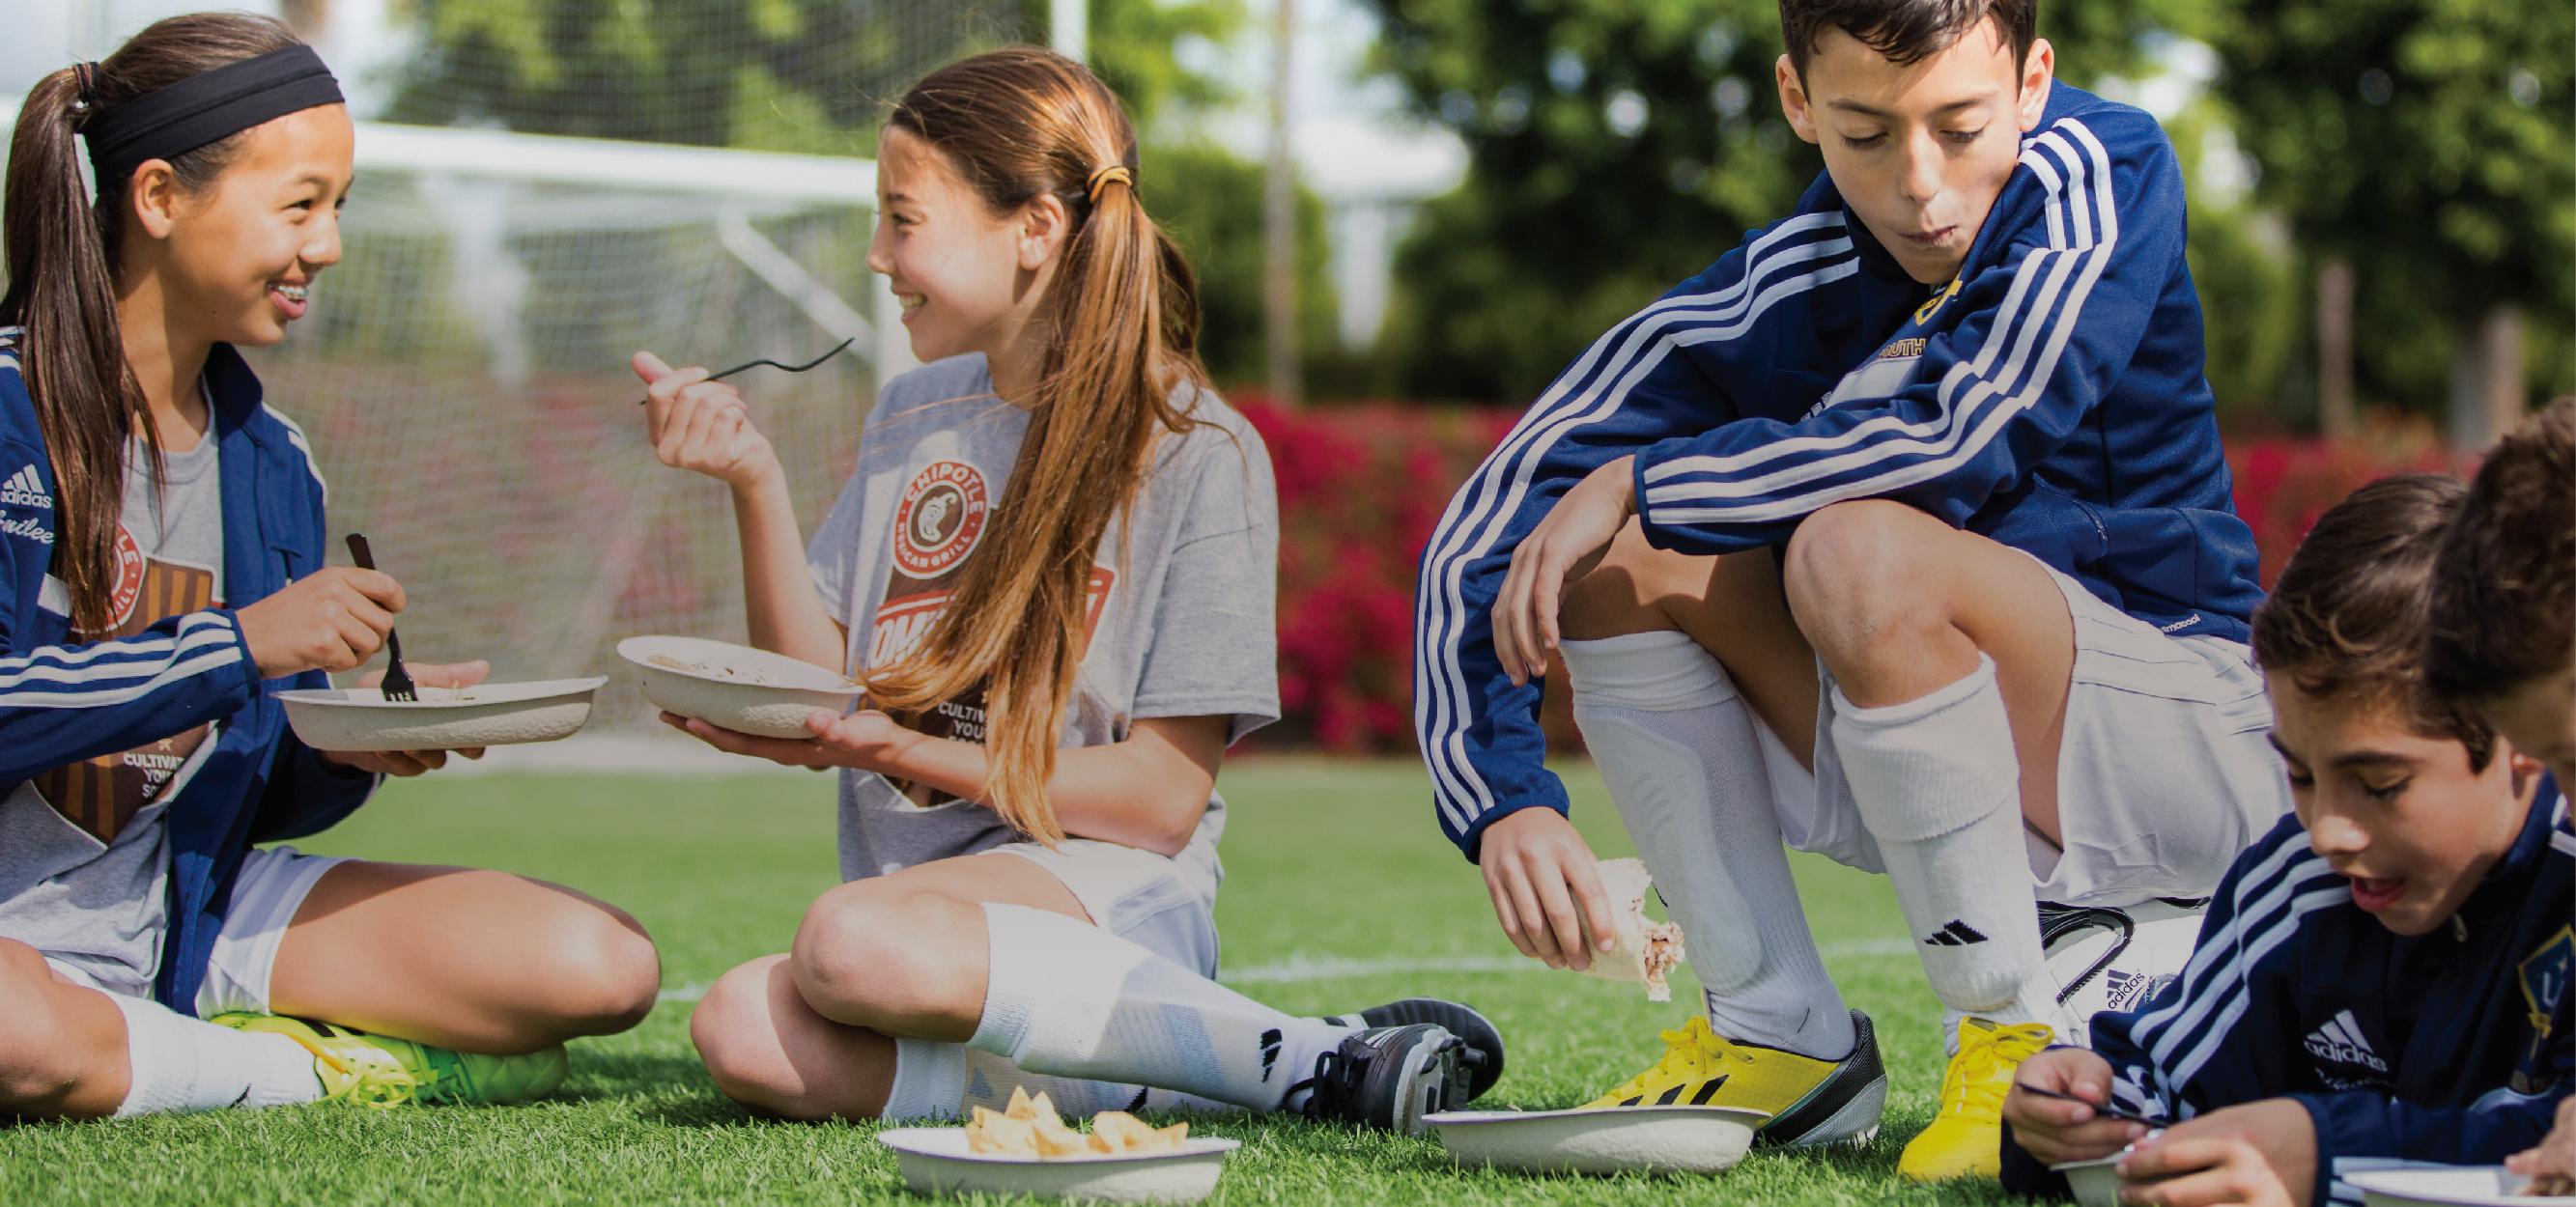 https://d5bzqyuki558t.cloudfront.net/cms-assets/system/asset_versions/attachments/000/001/697/original/CMG-226-Youth-Soccer-Campaign_LandingPage_1280x600_0000_3.jpg?1459539679